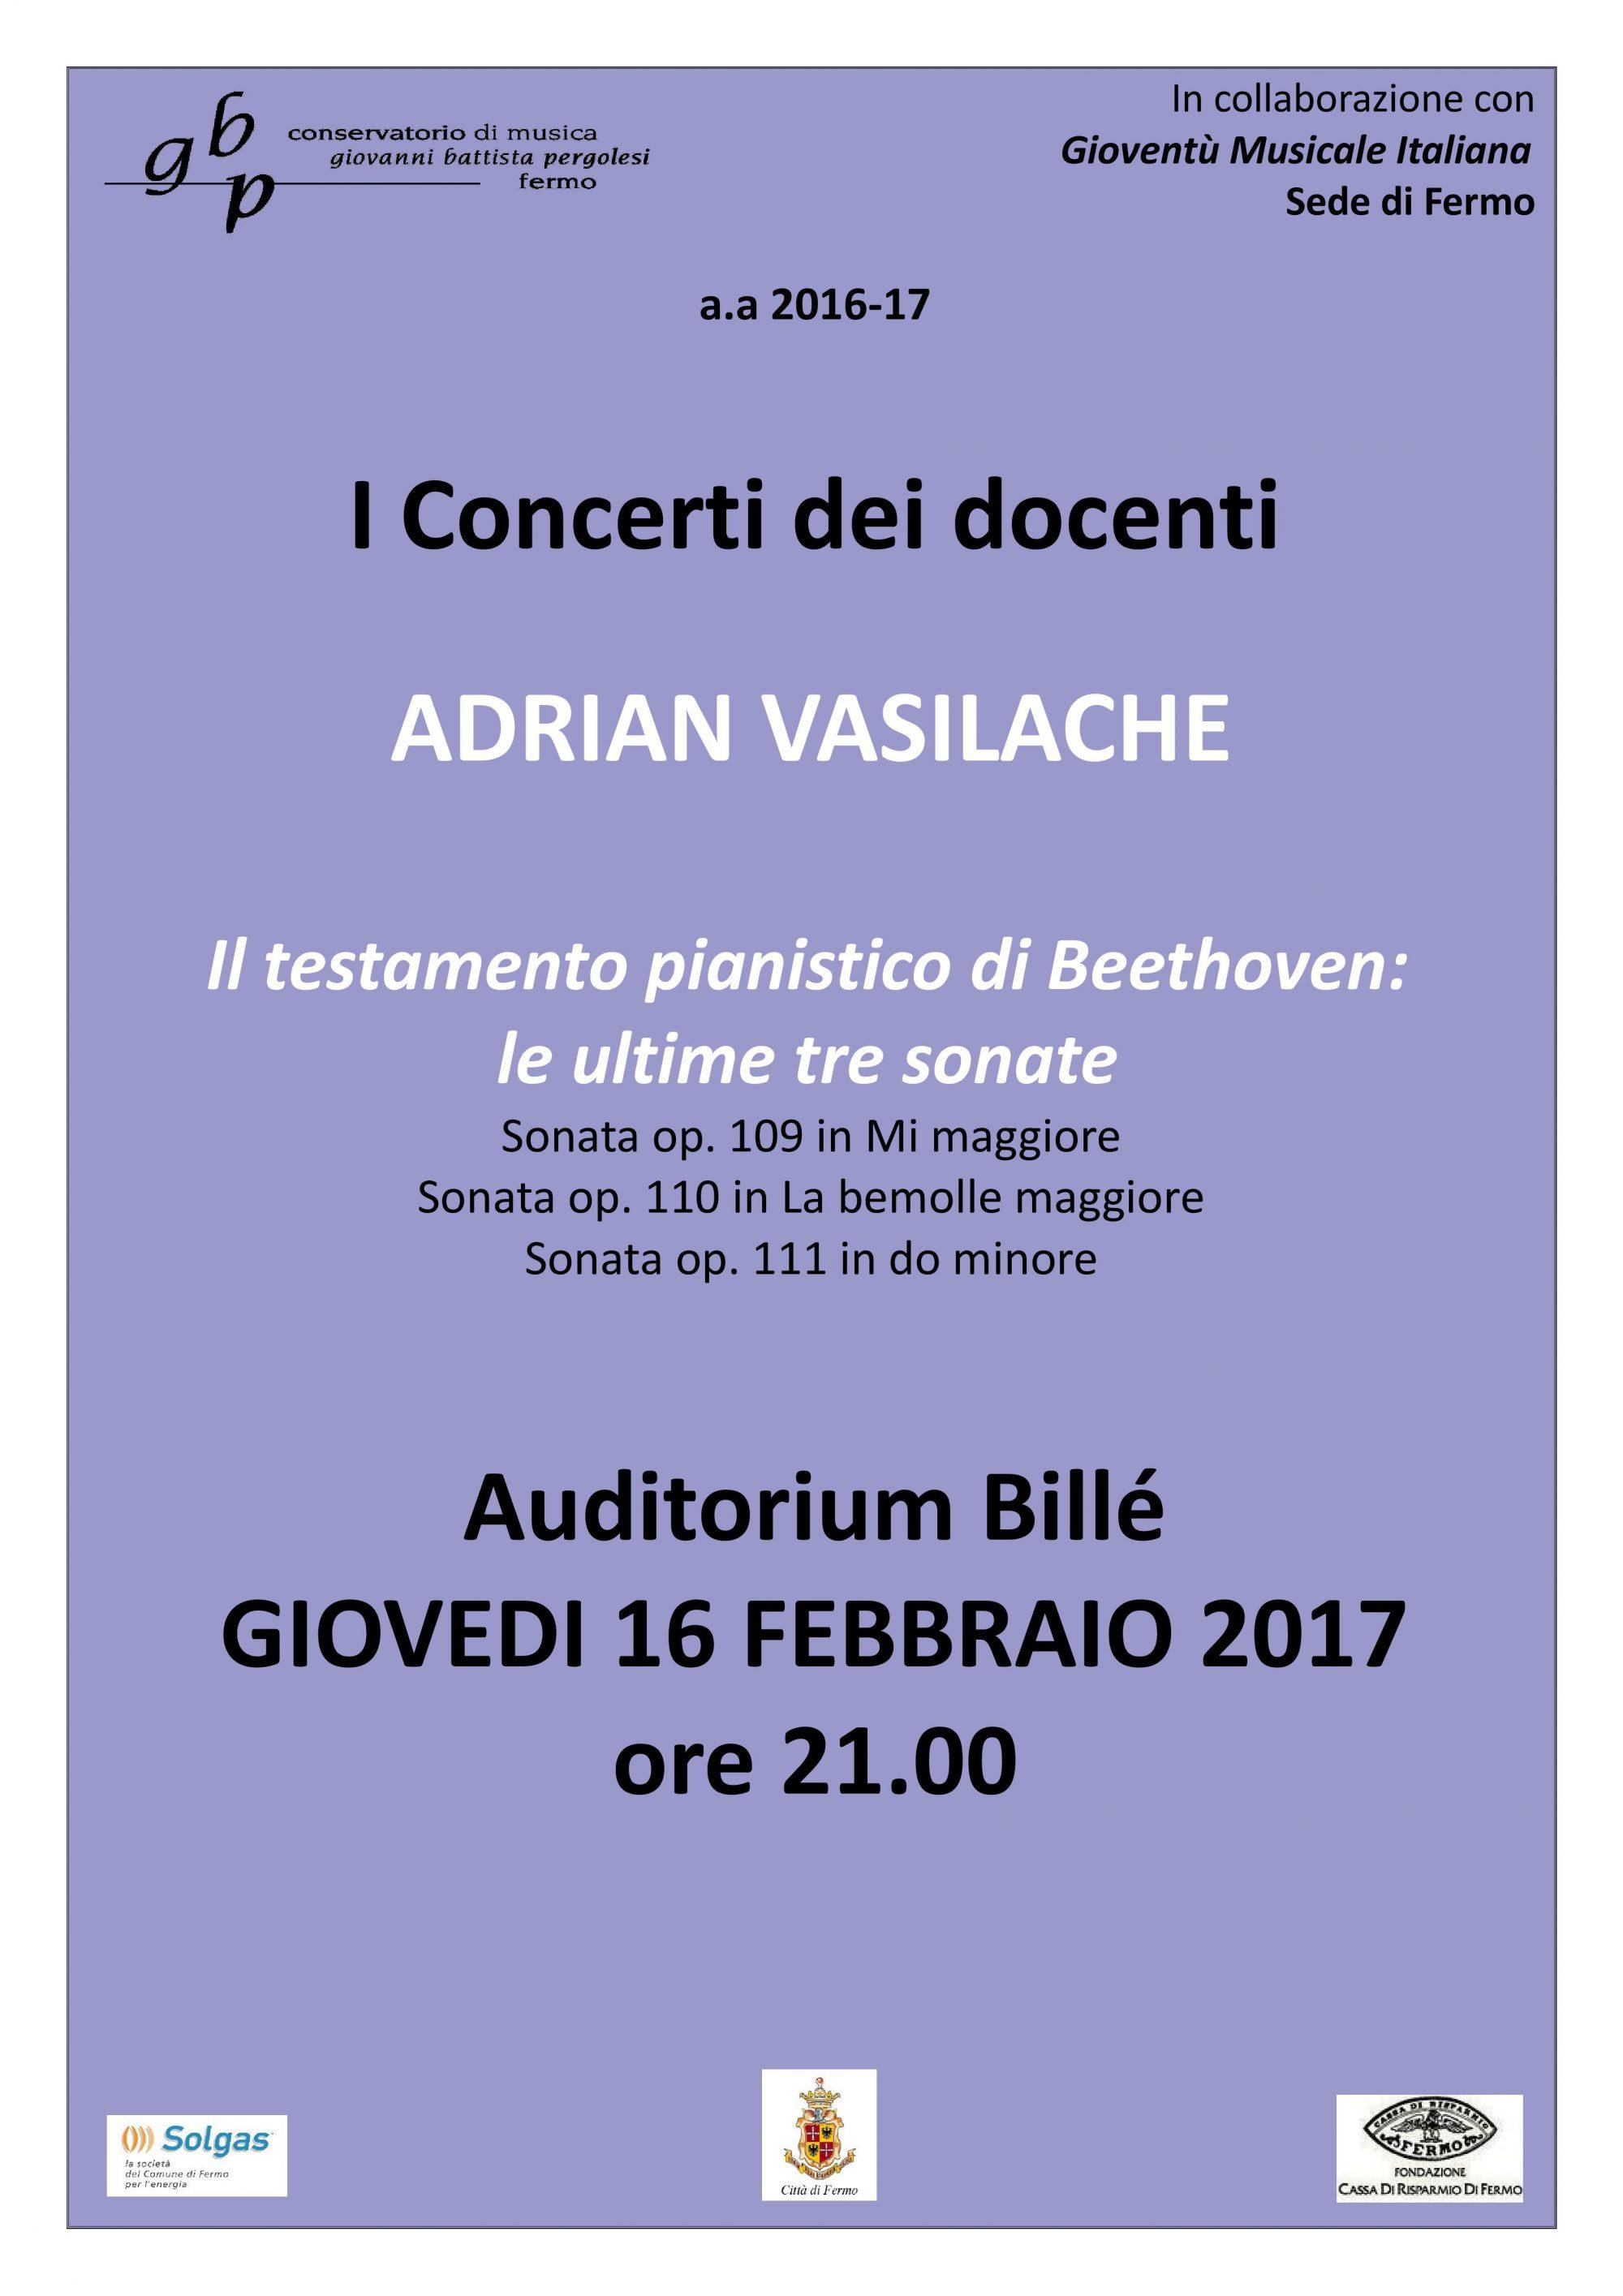 Locandina Concerto Vasilache 16 febb 2017